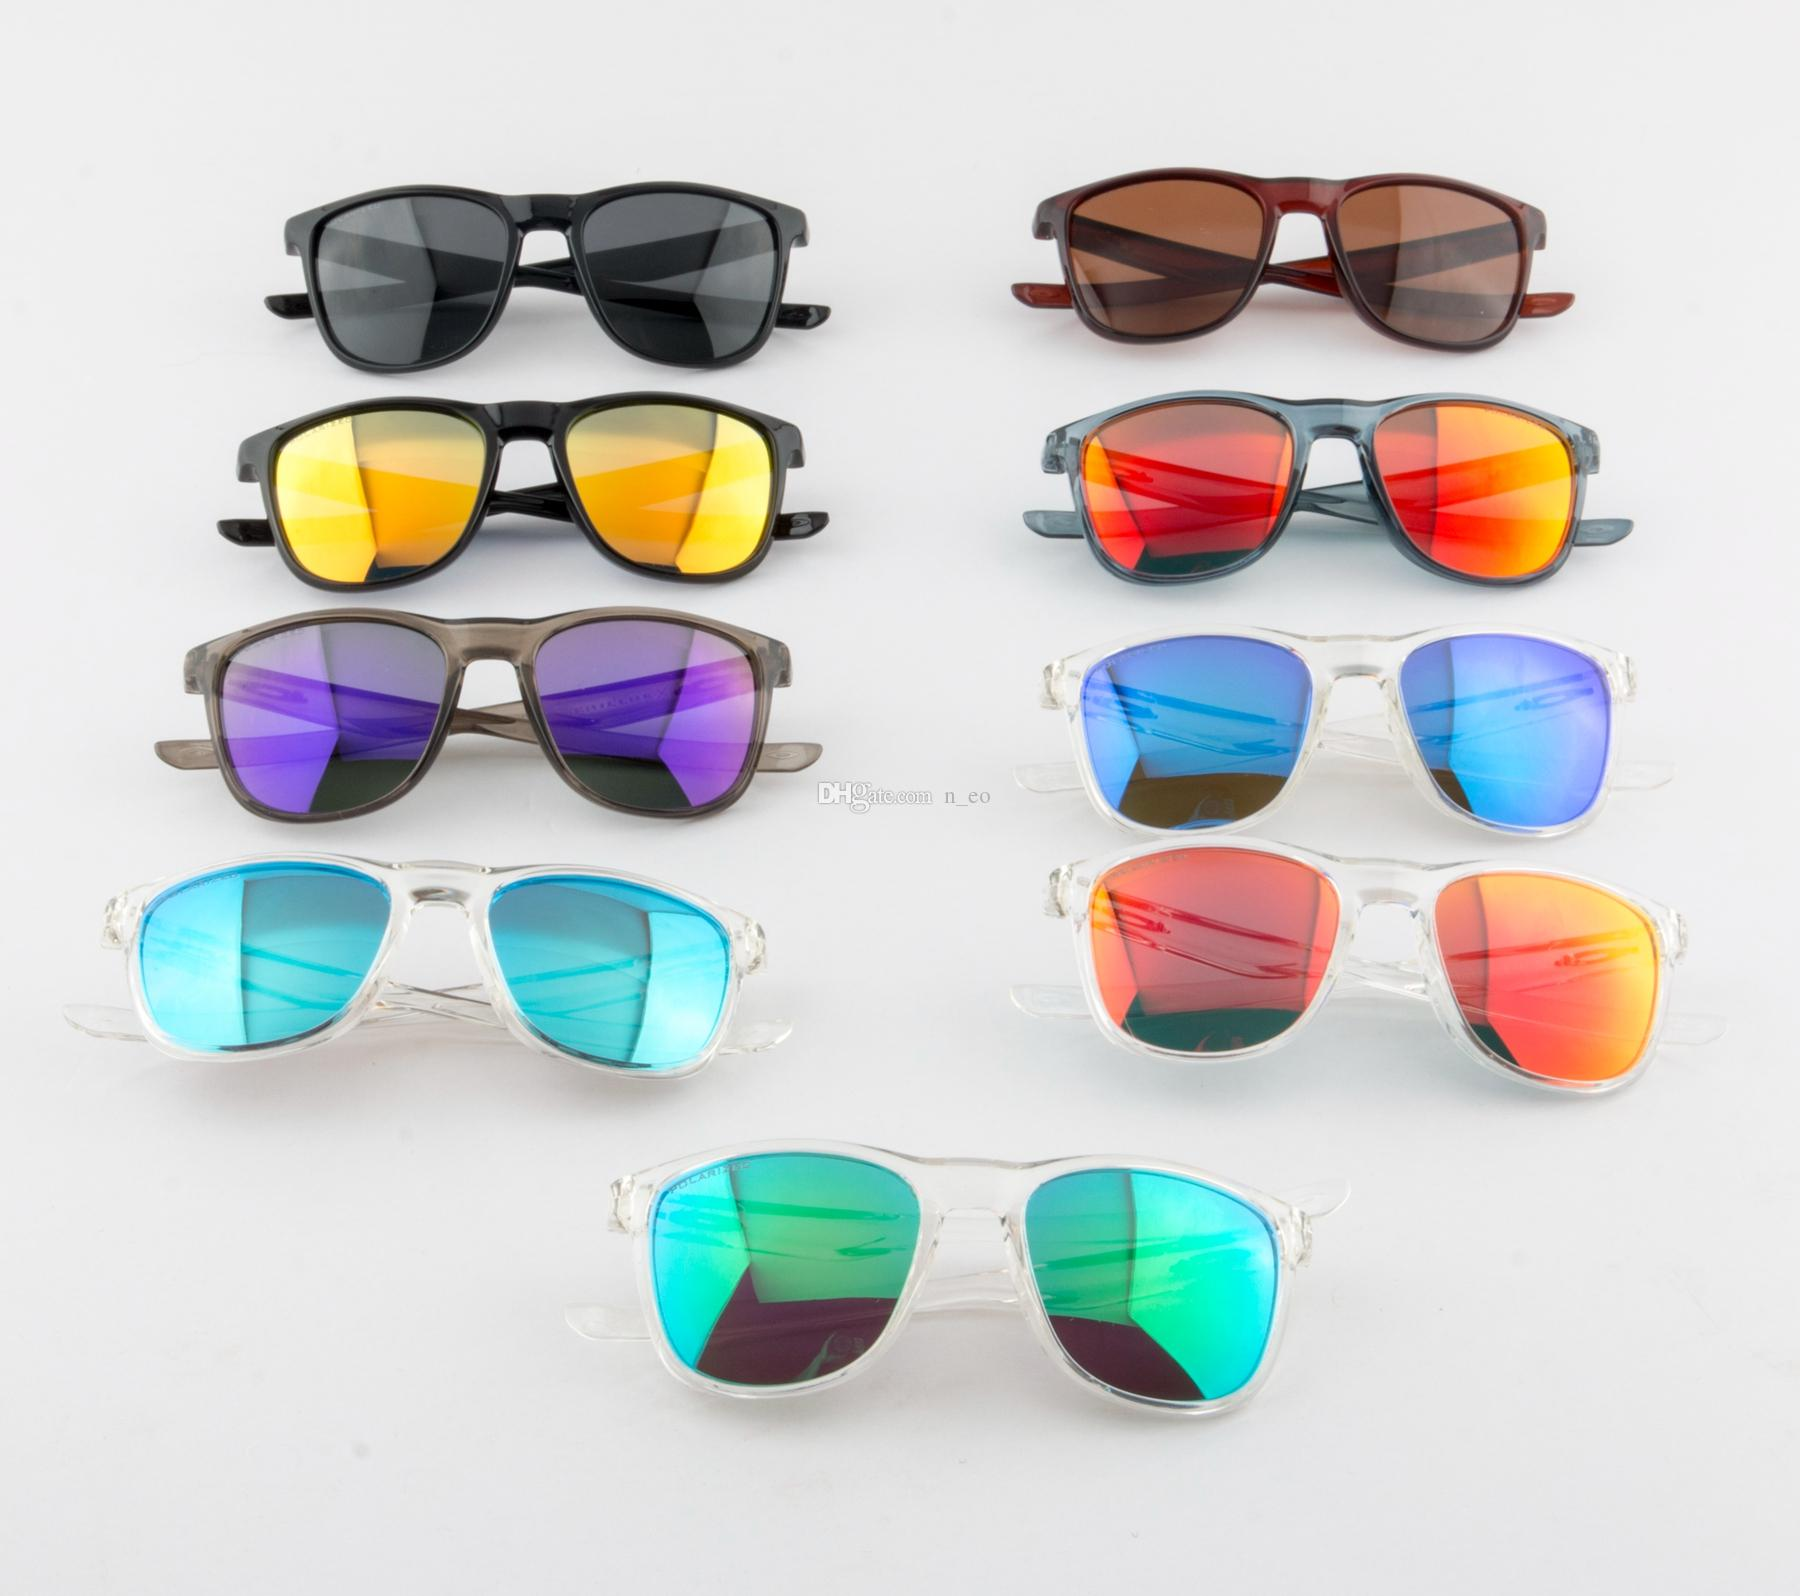 ee70e0e845 Soscar Trillbe X Sunglasses For Cycling Sports Sunglasses Brand Designer  Polarized High Definition Lens Comfortably Lightweight SUN Glasses  Sunglases Cheap ...